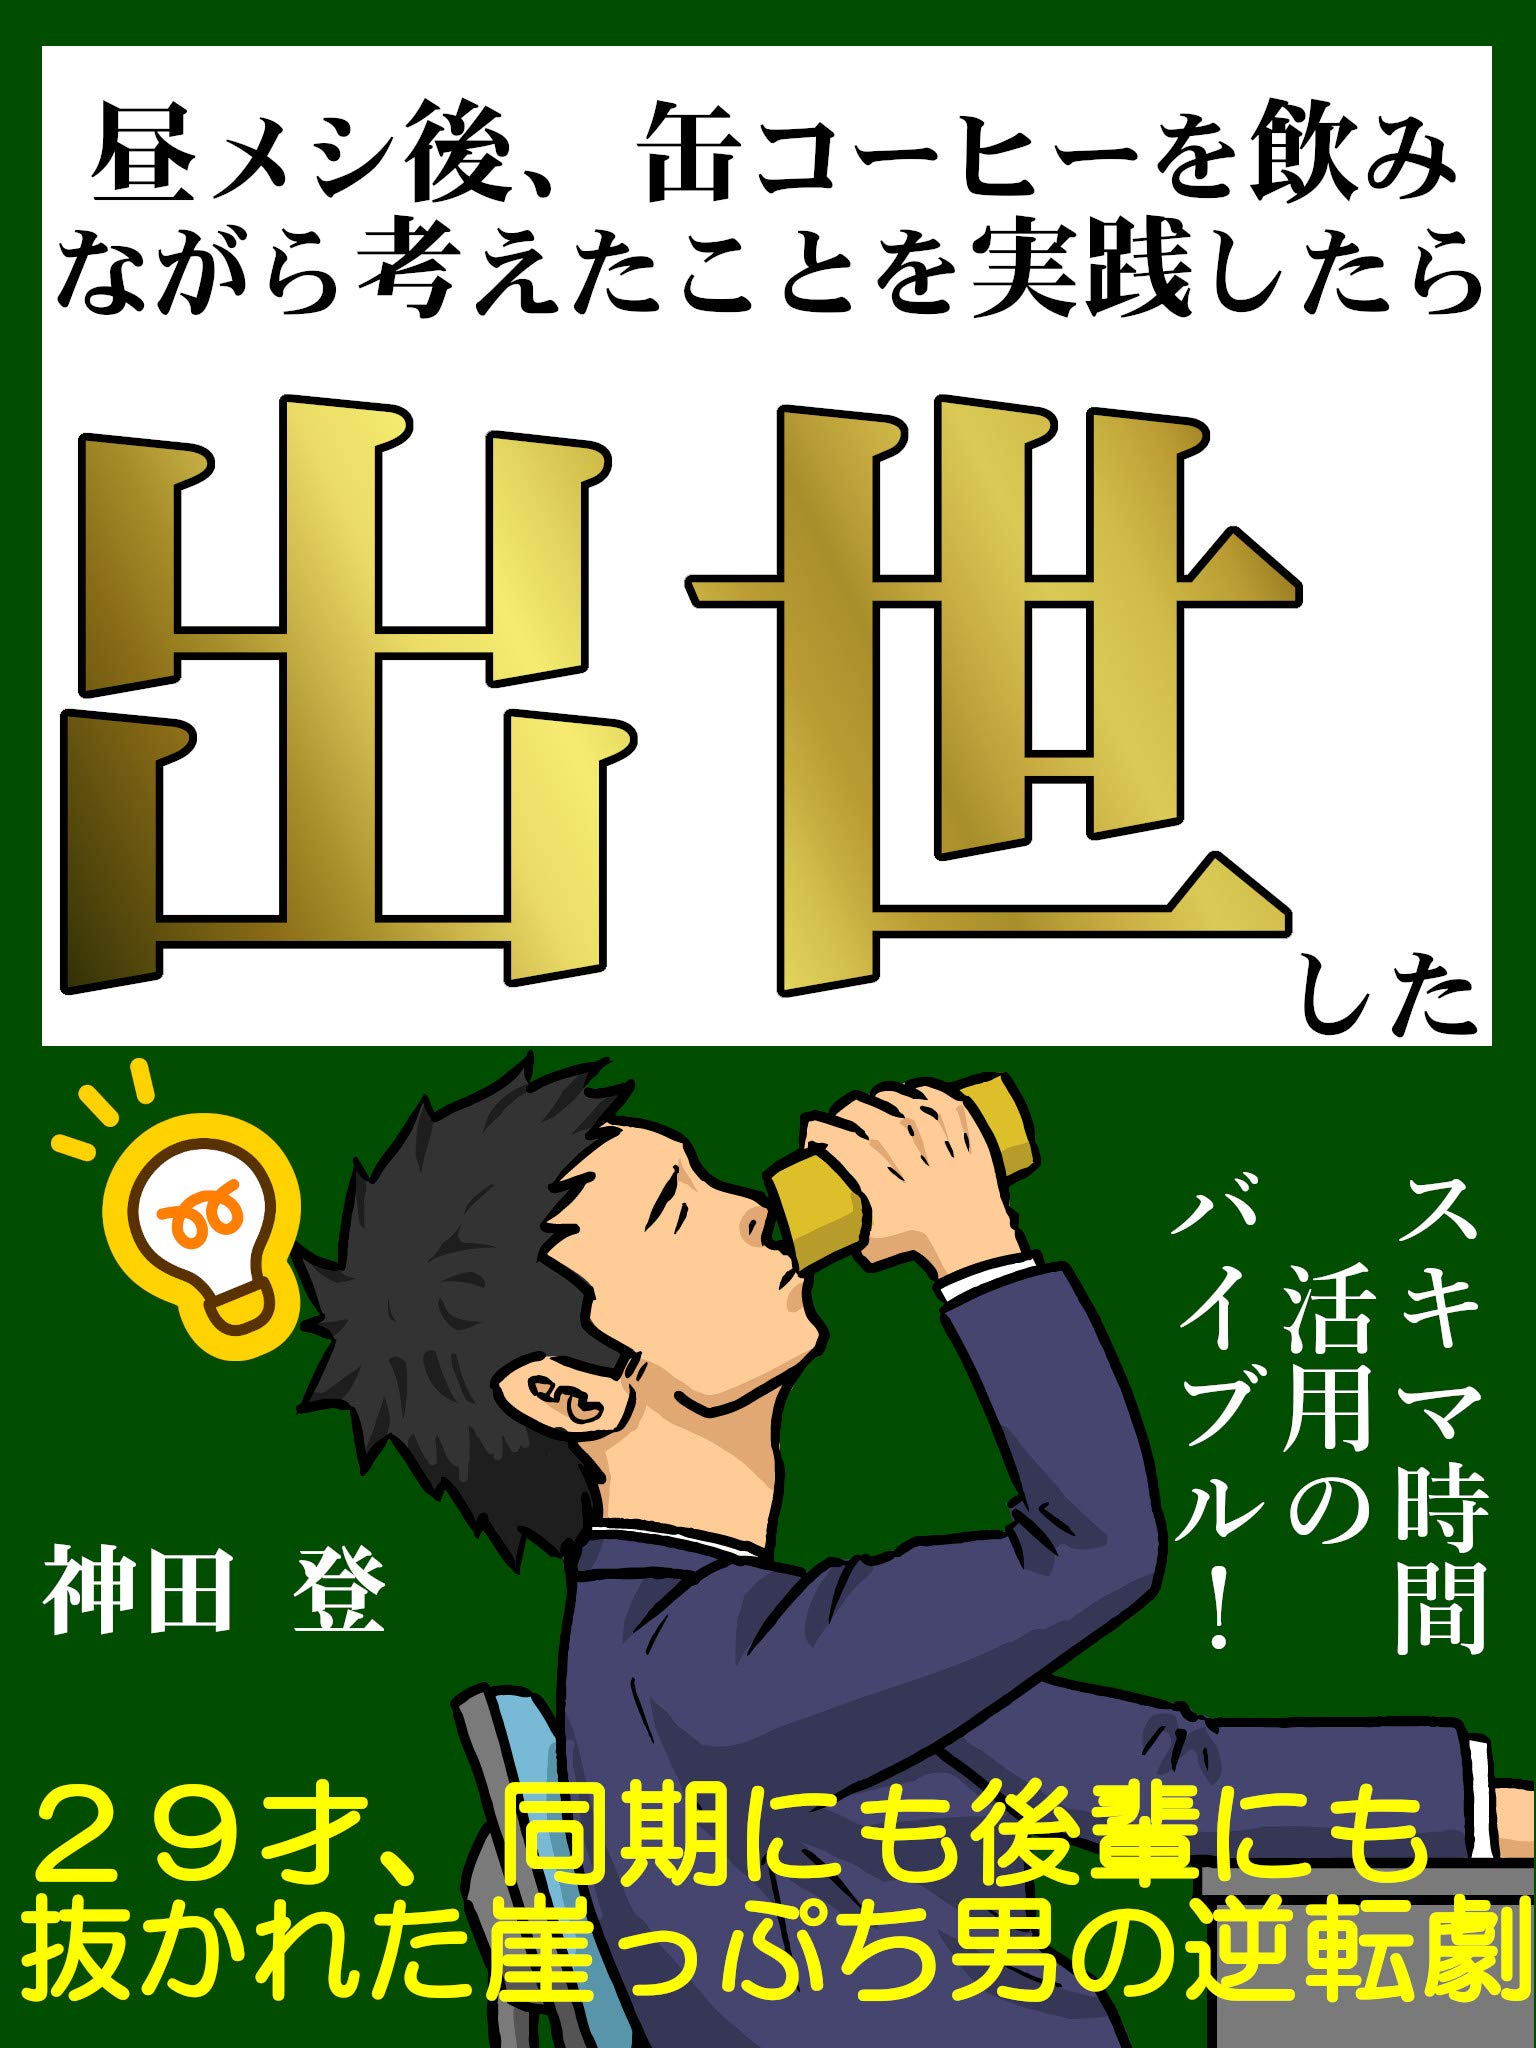 hirumeshigokankohhiiwonominagarakangaetakotowojissenshitarasyusseshita: nijyukyusaigakeppuchiotokonogyakutengeki (Japanese Edition)